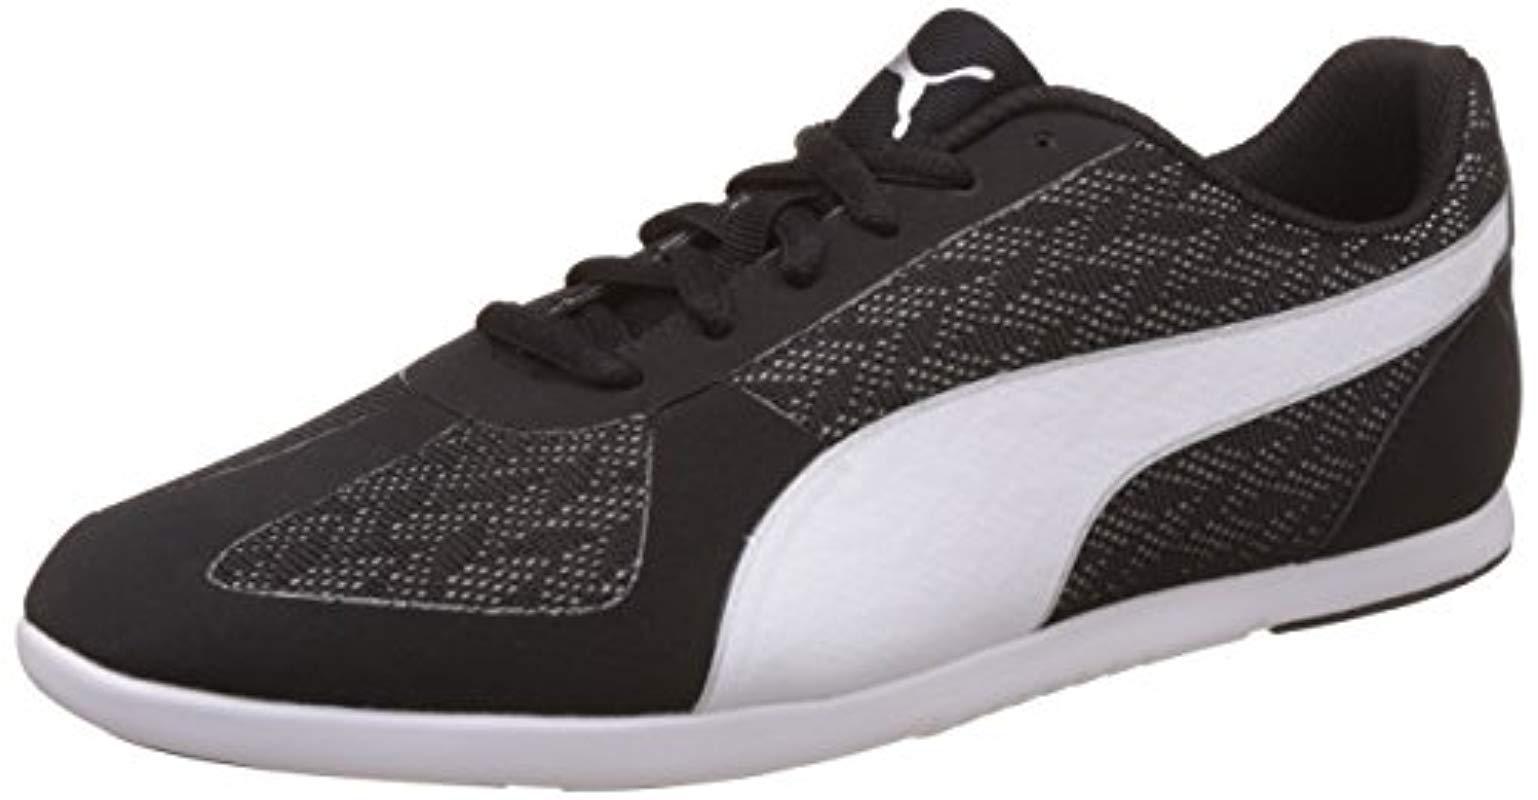 detailed look eb9b1 9c2e3 puma-Black-Puma-Black-puma-White-02-Modern-Soleil-Quill-Trainers.jpeg